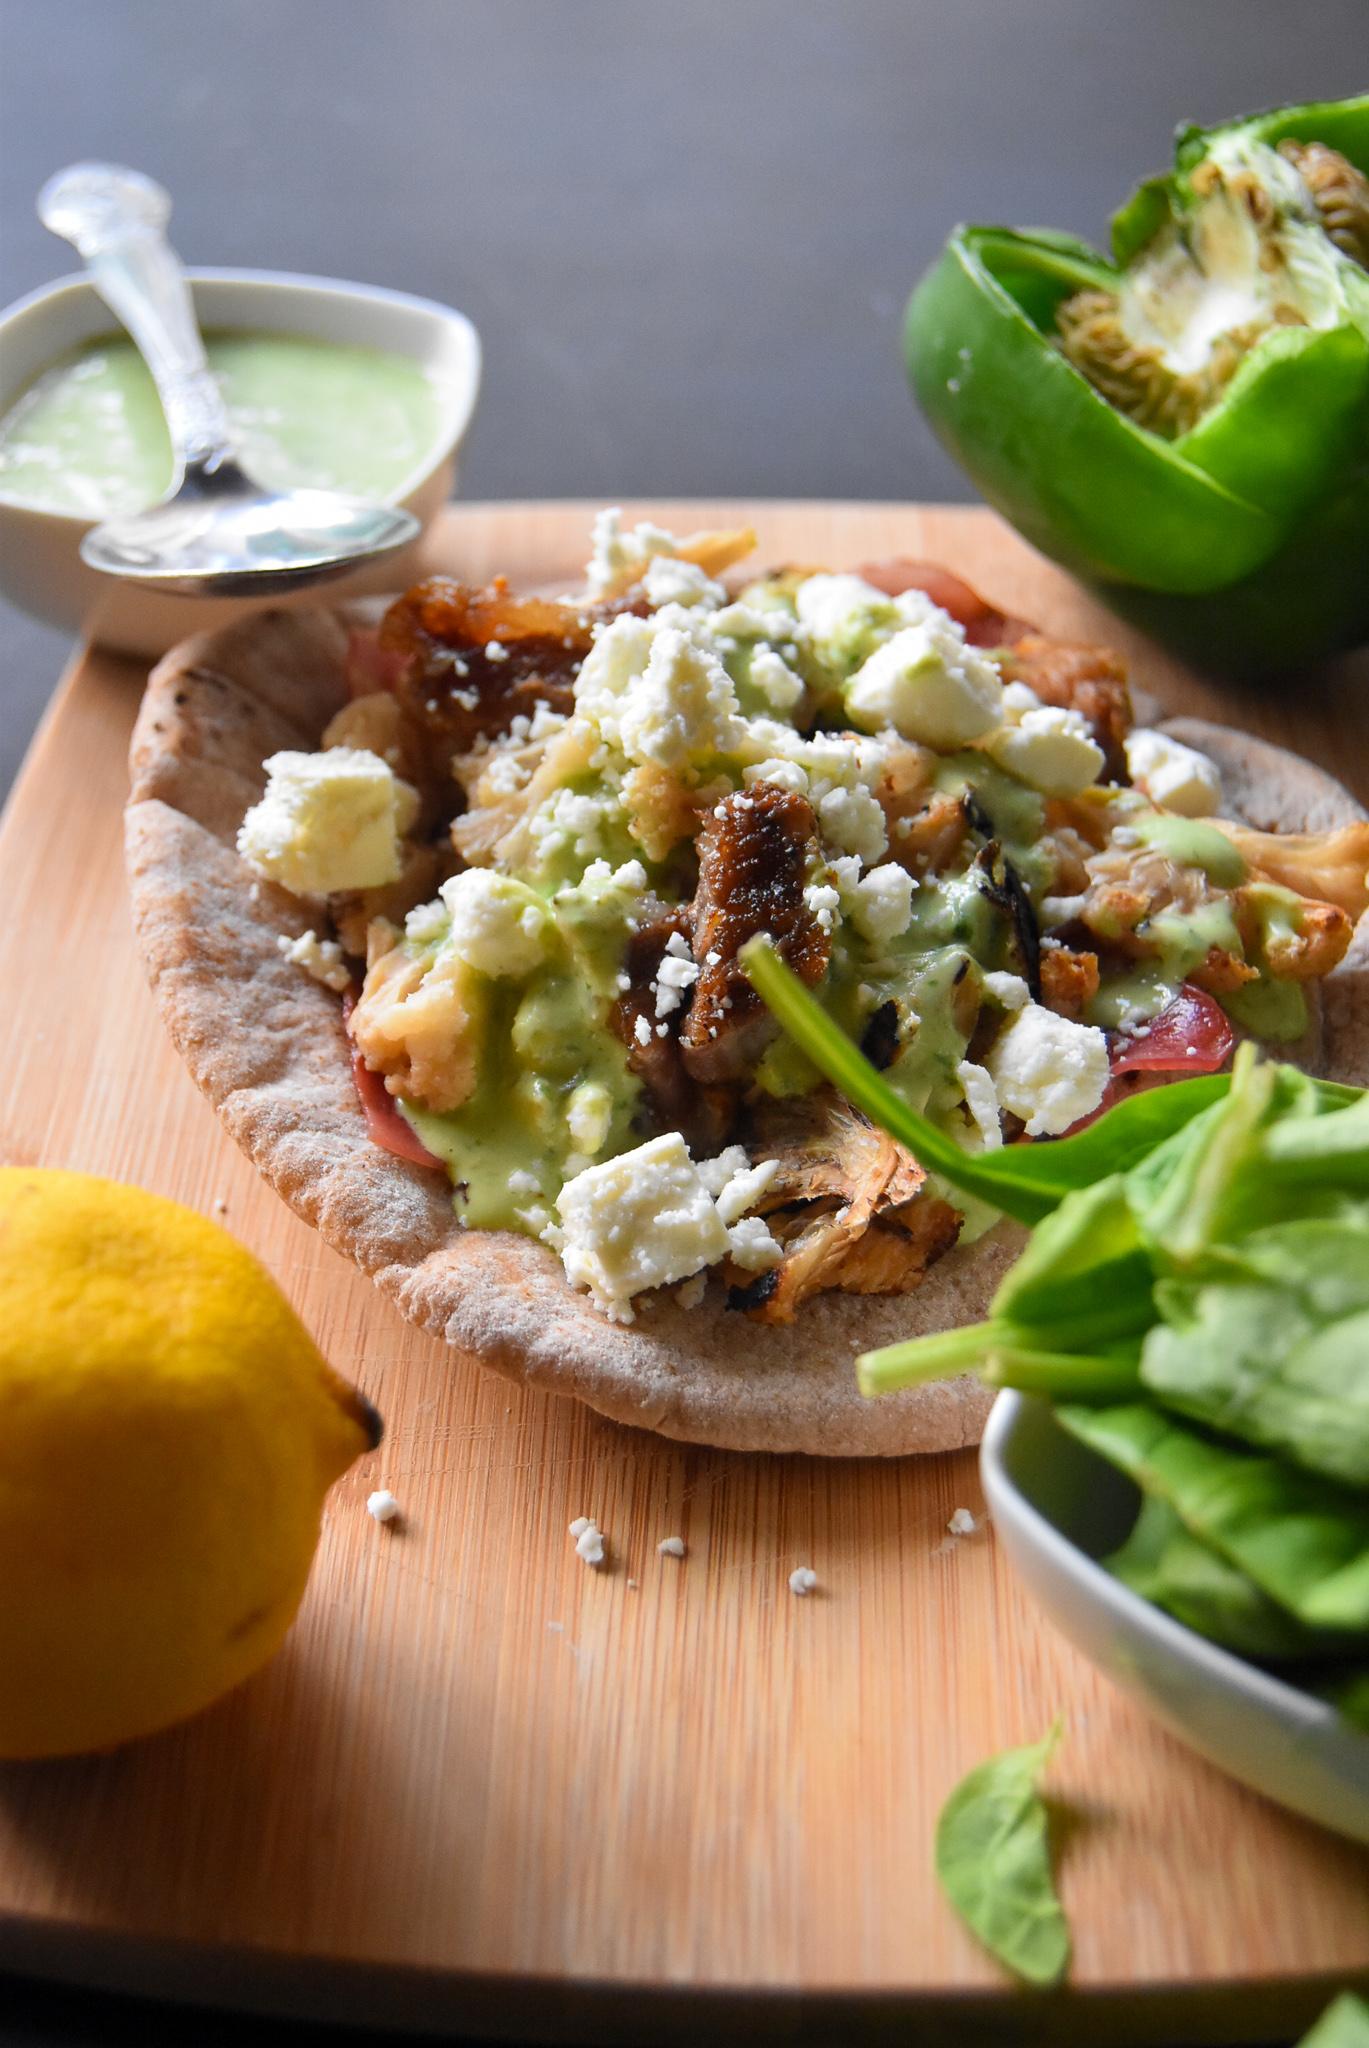 Cauliflower Shawarma Wraps with Green Tahini and Feta 2.jpg